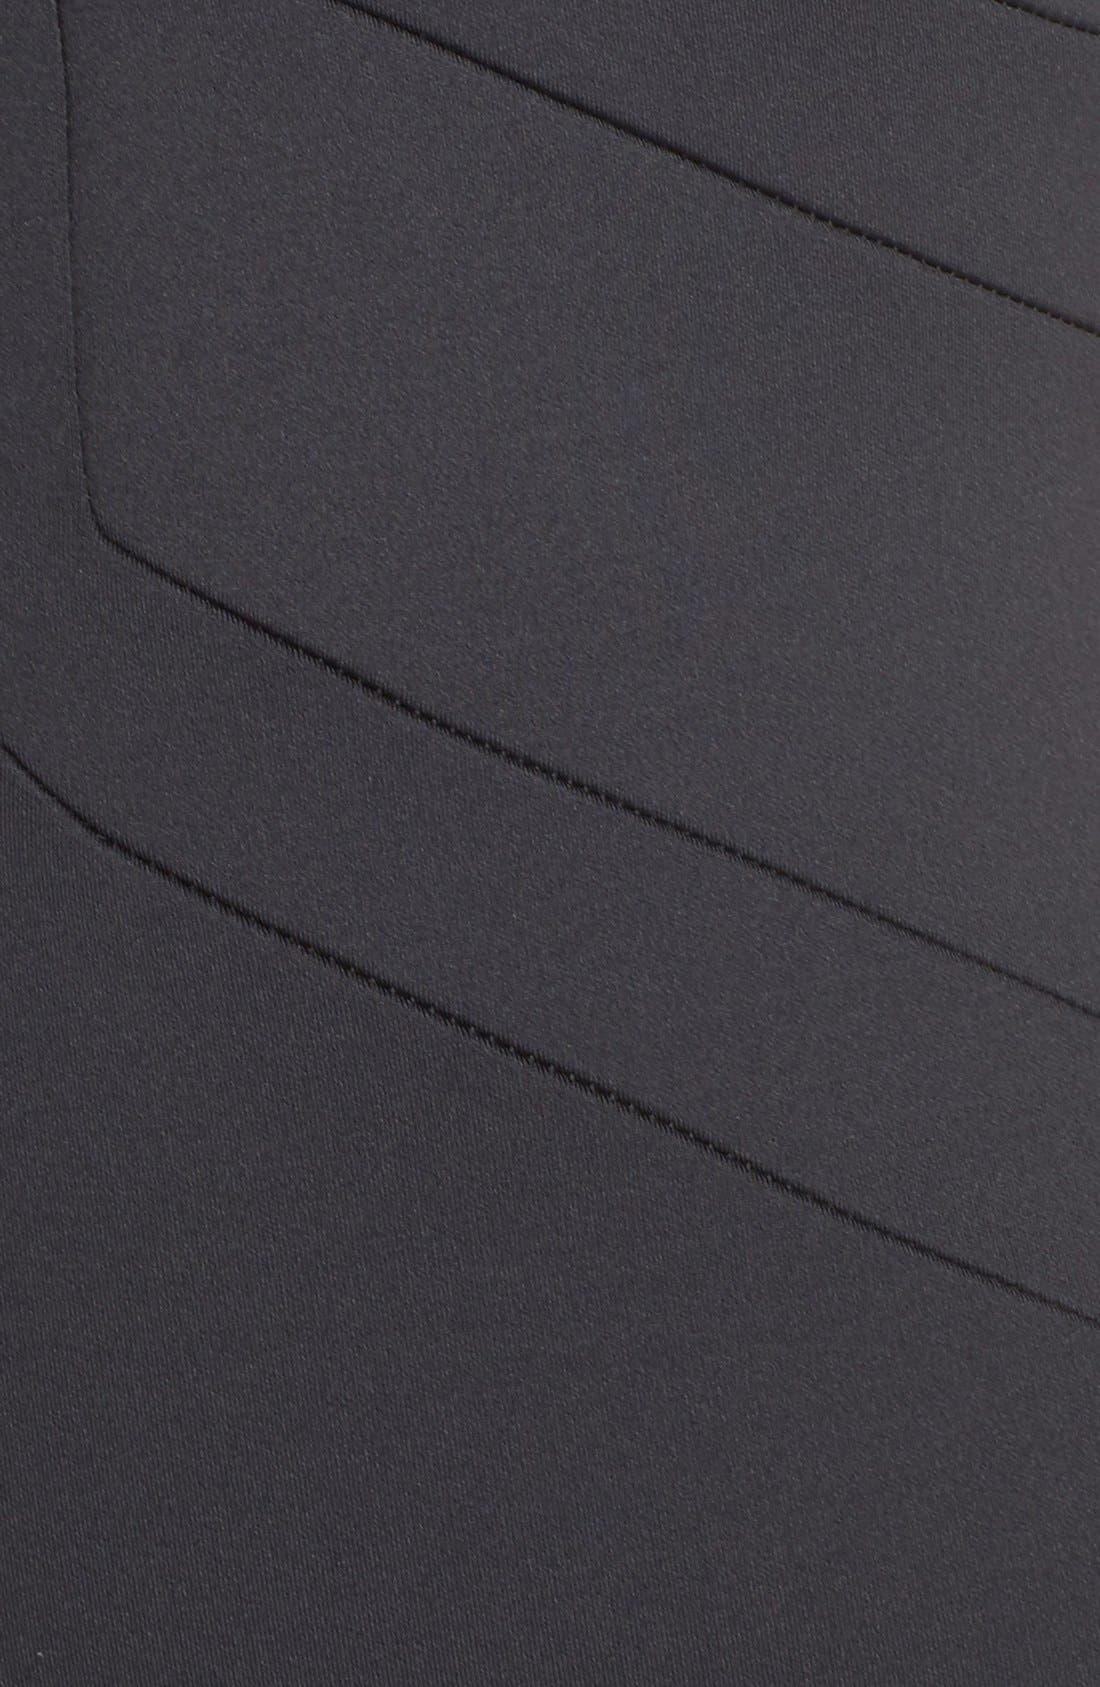 Alternate Image 5  - Magic Suit by Miraclesuit® 'Scuba - Skyler' One-Piece Swimsuit